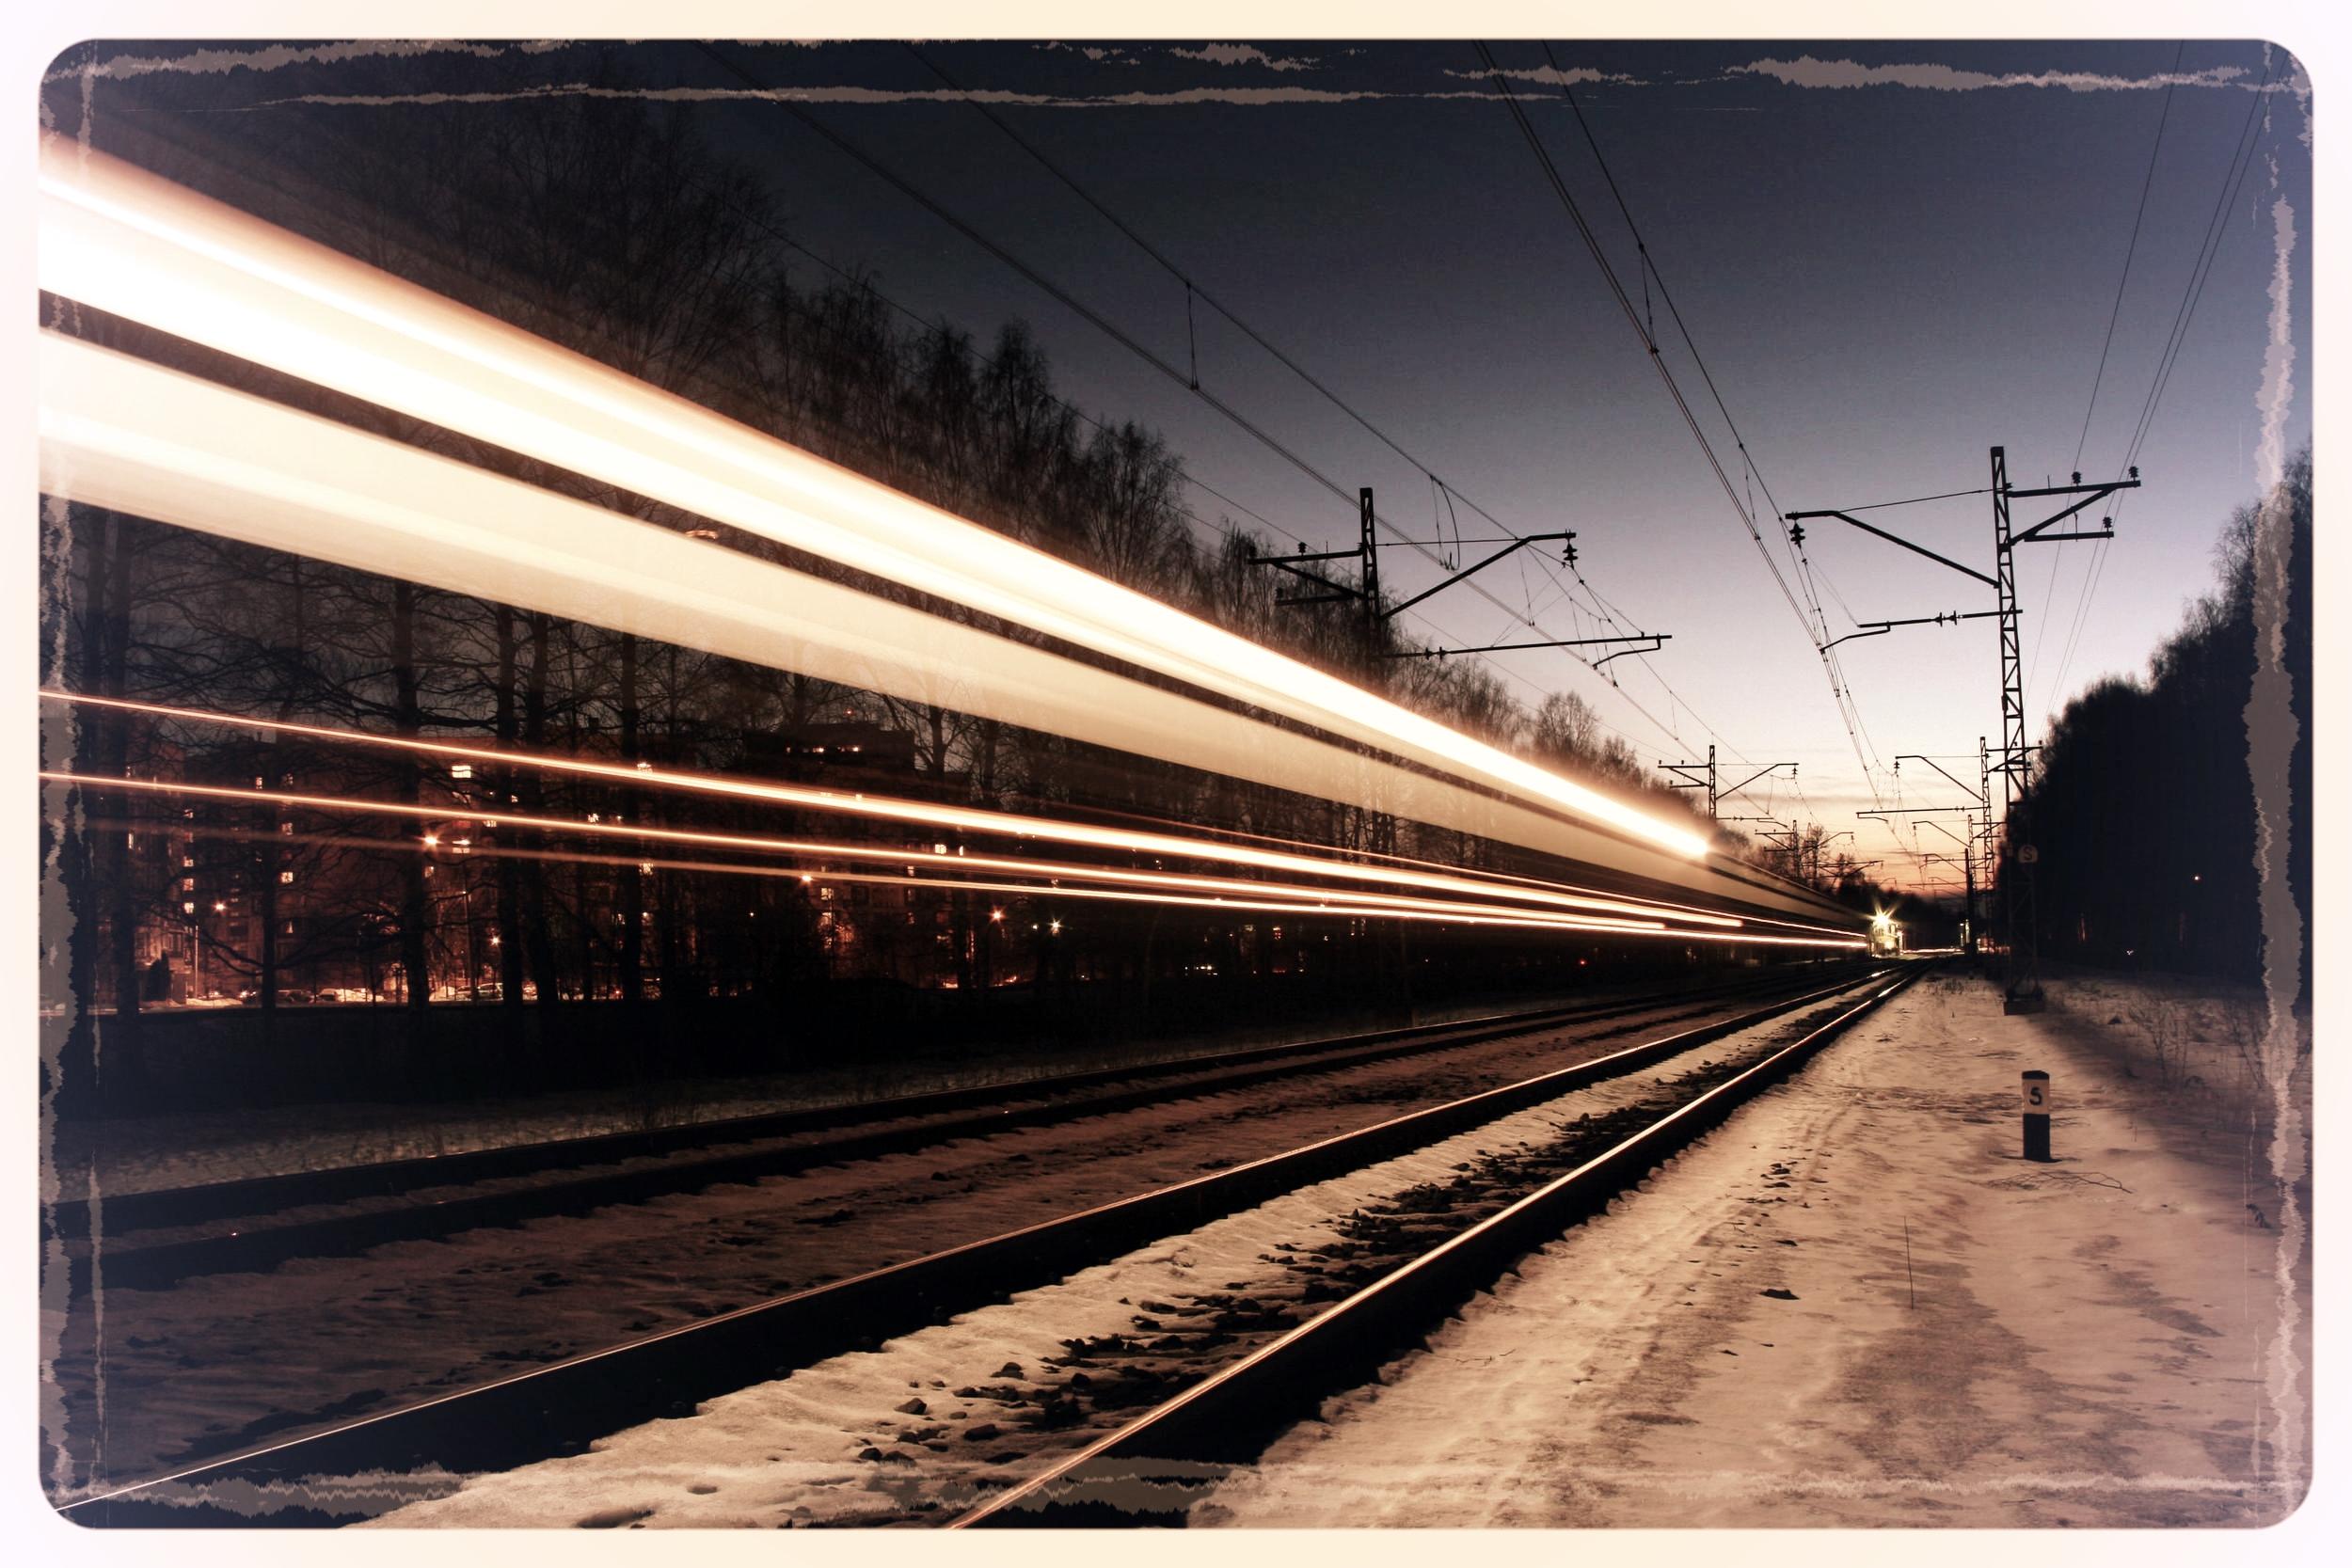 night_train.jpg